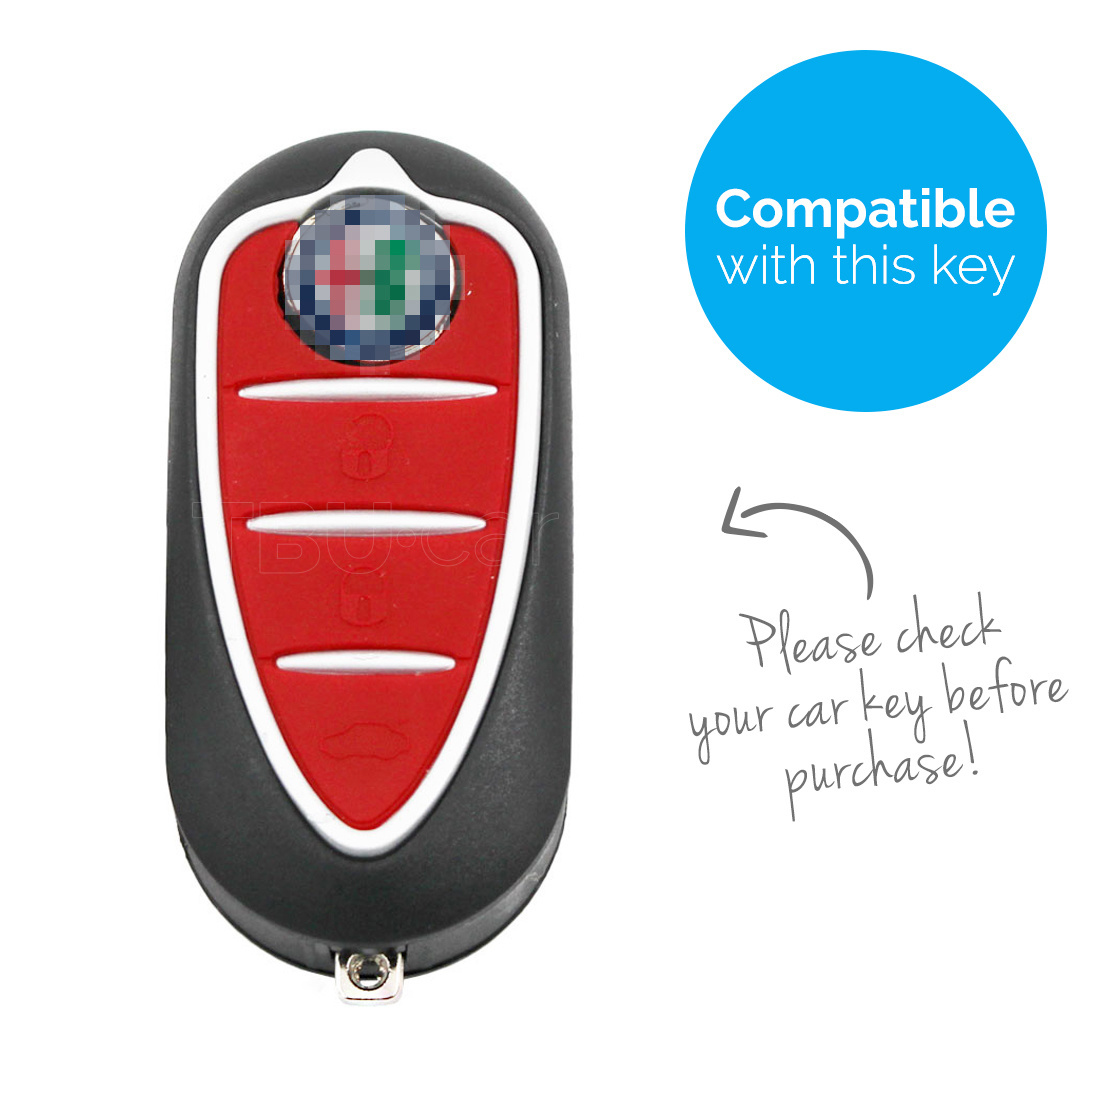 TBU car Alfa Romeo Sleutel Cover - Silicone sleutelhoesje - beschermhoesje autosleutel - Blauw